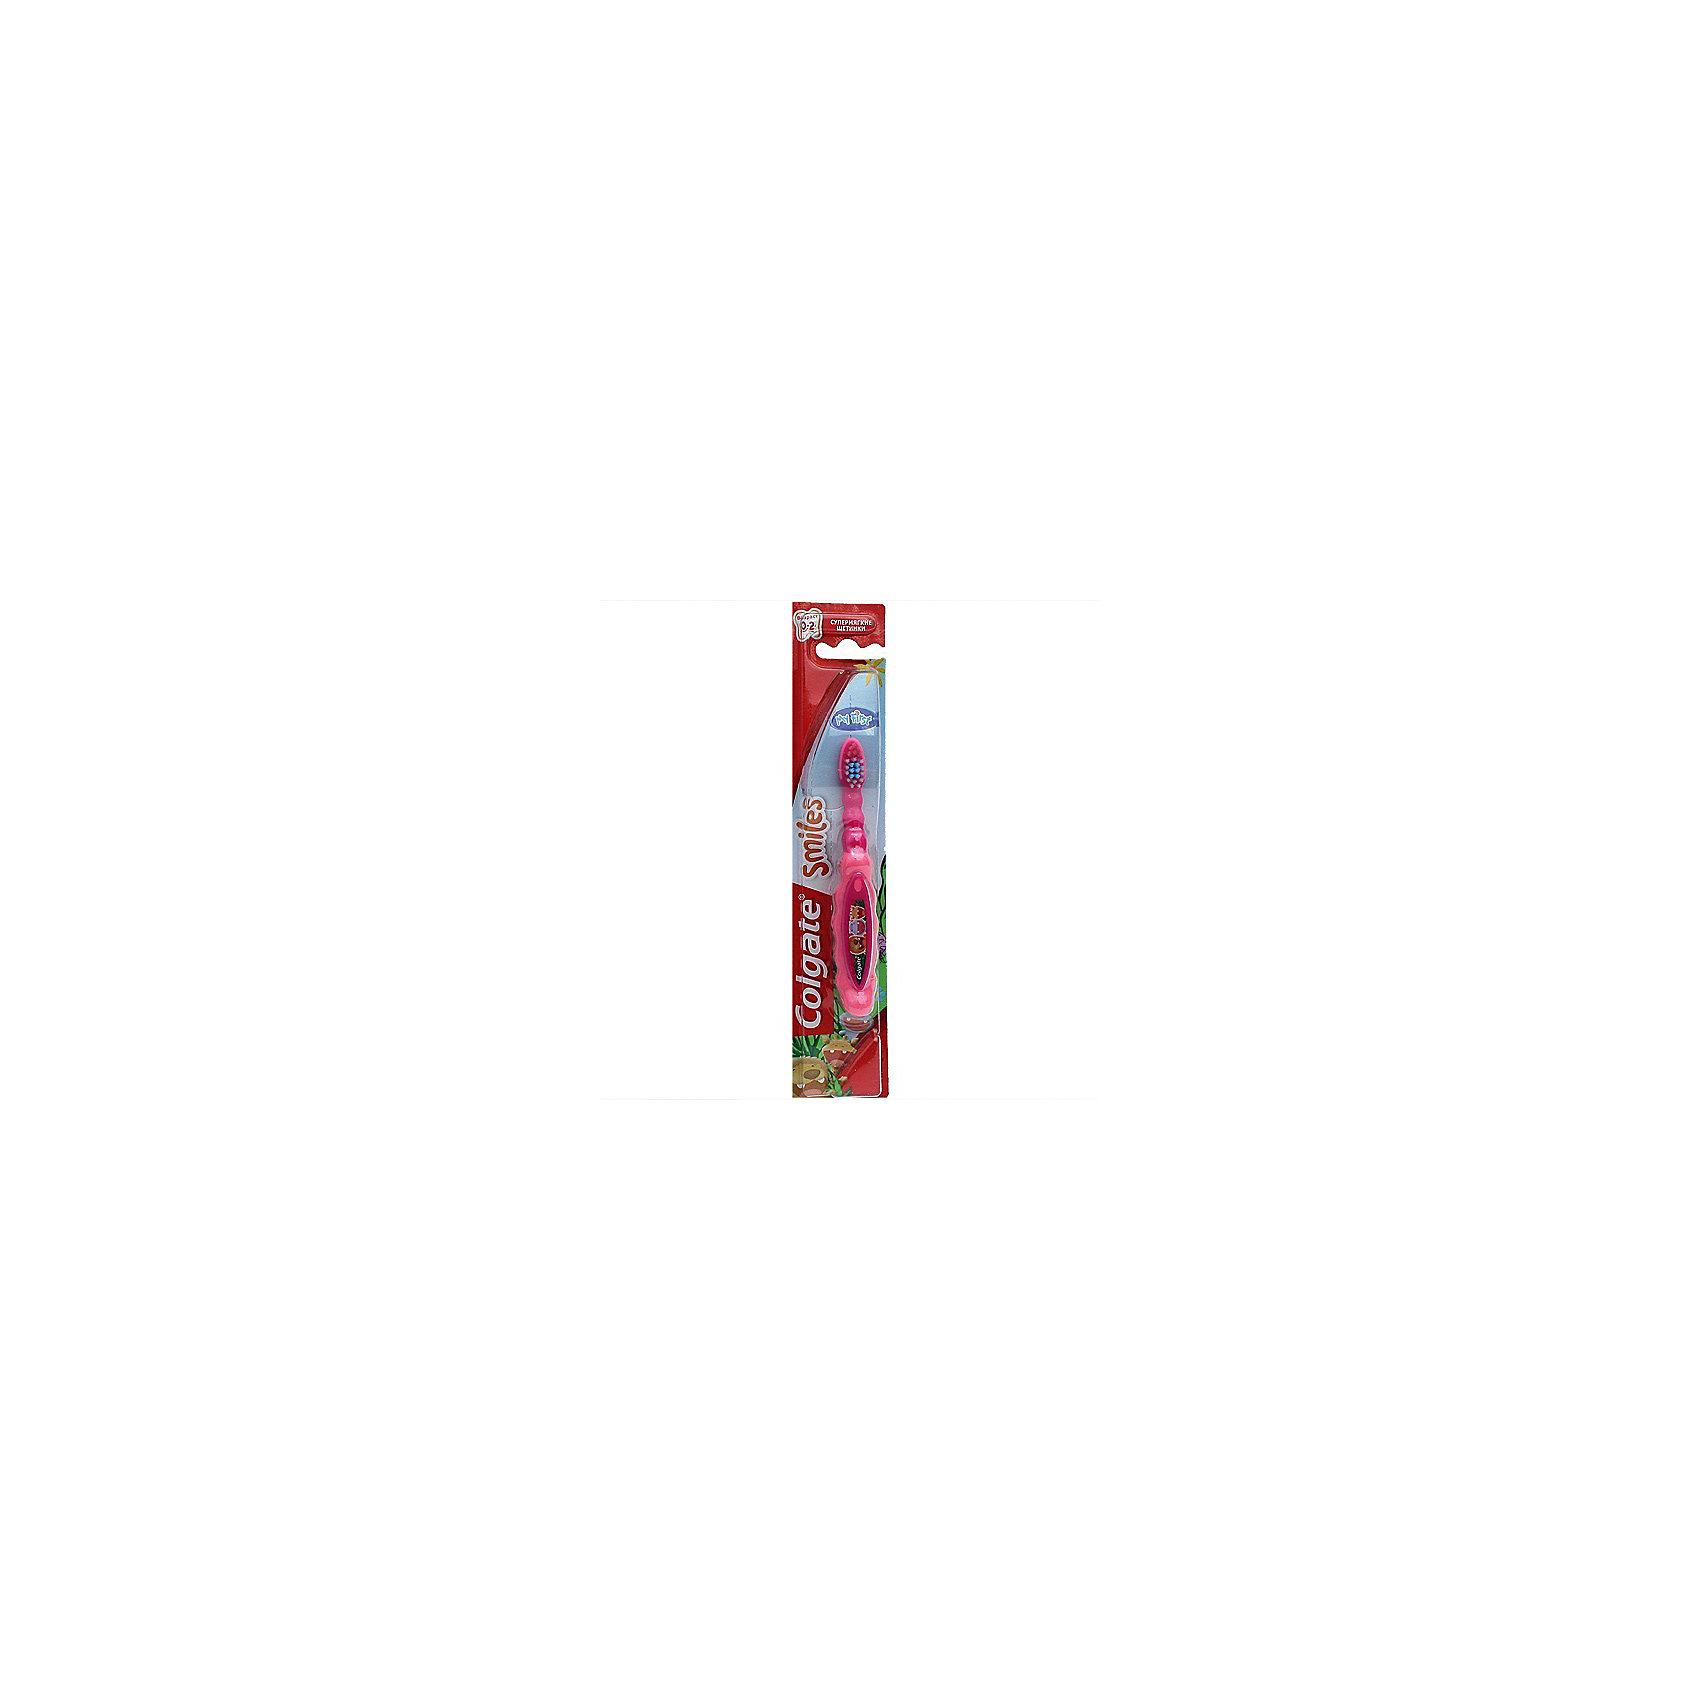 Зубная щётка Смайлс  супермягкая для детей от 0 до 2 лет, Colgate, розовый